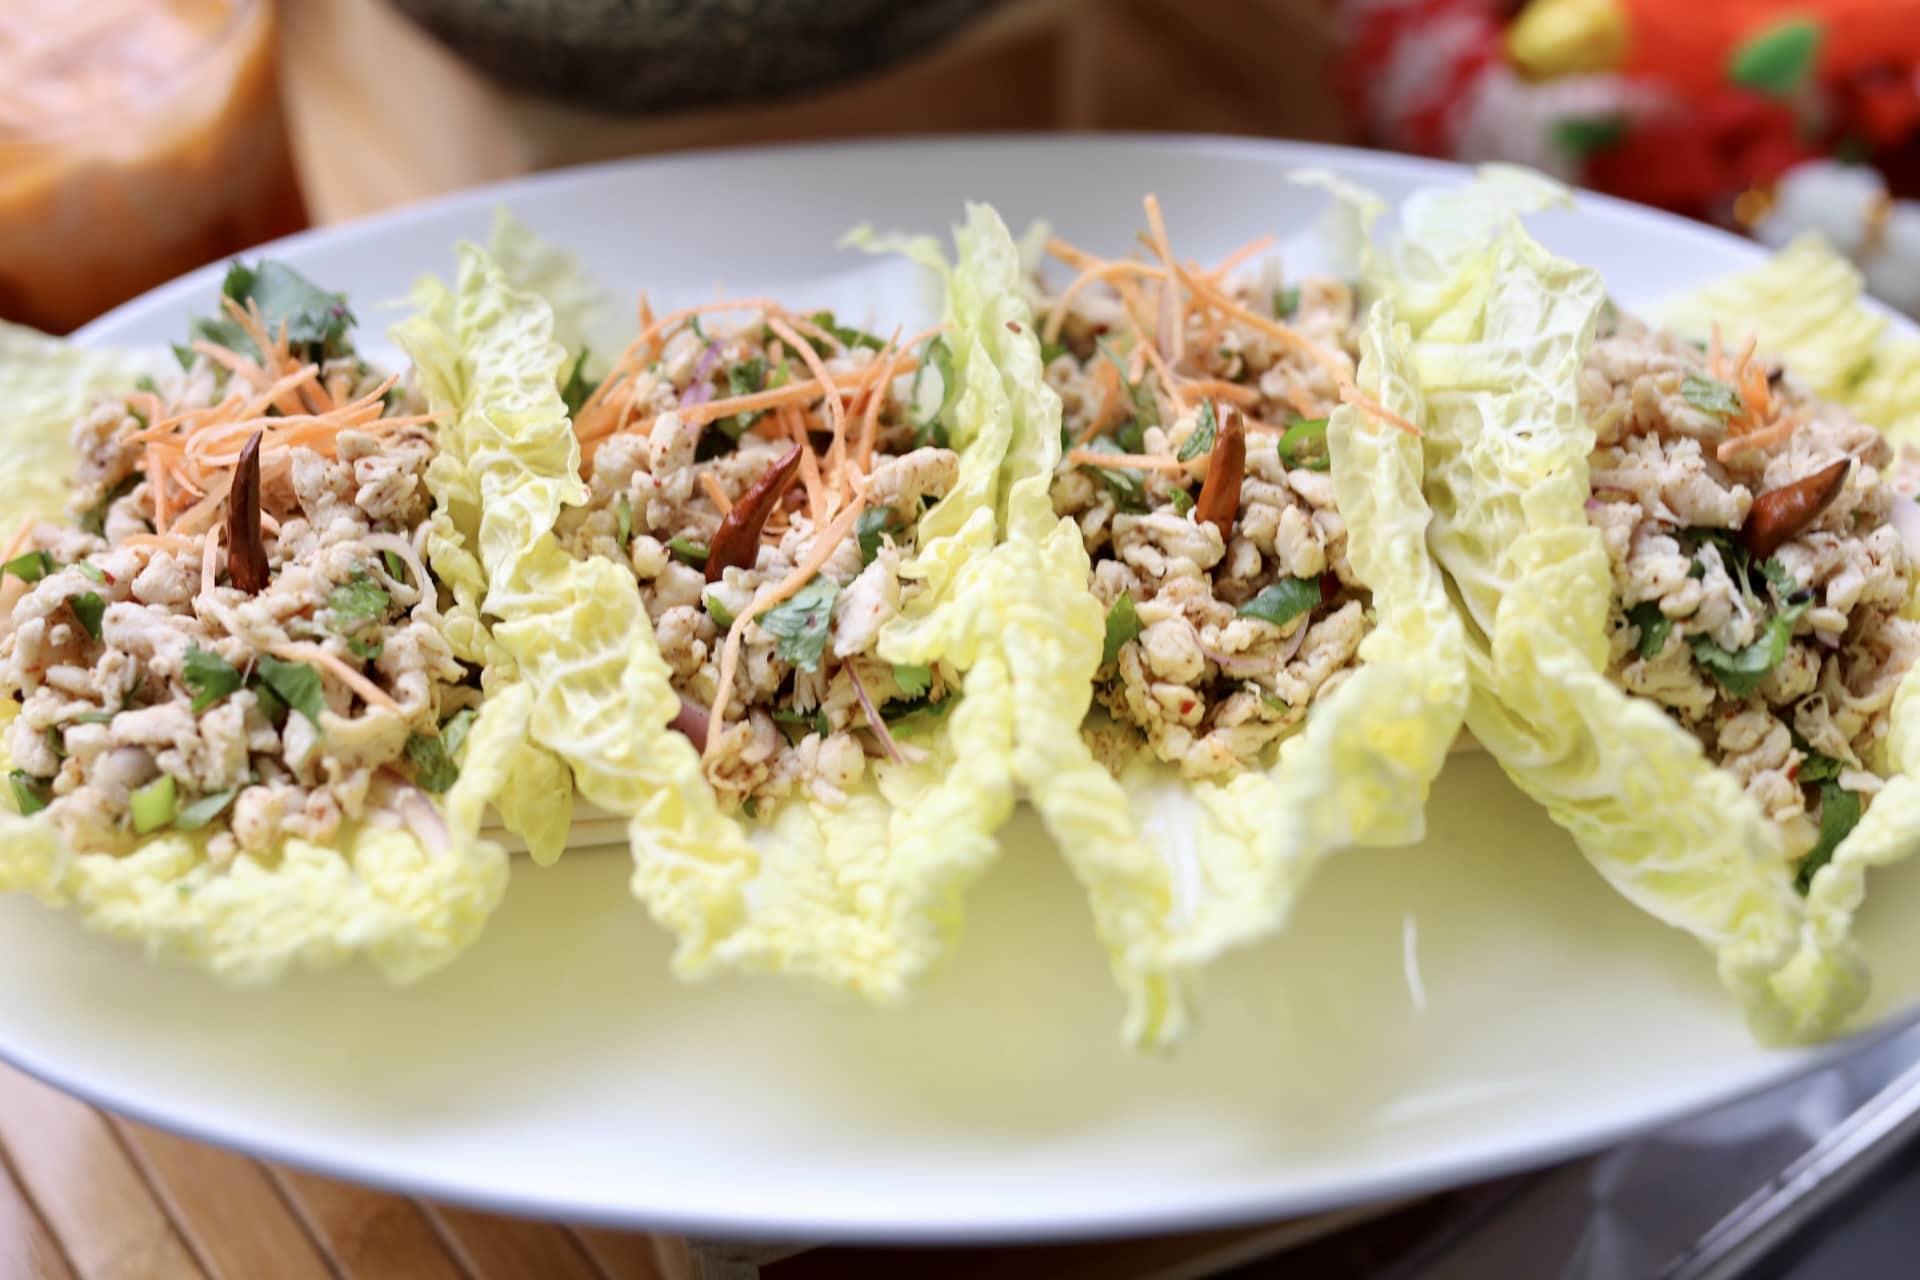 chicken lettuce wraps, songkran